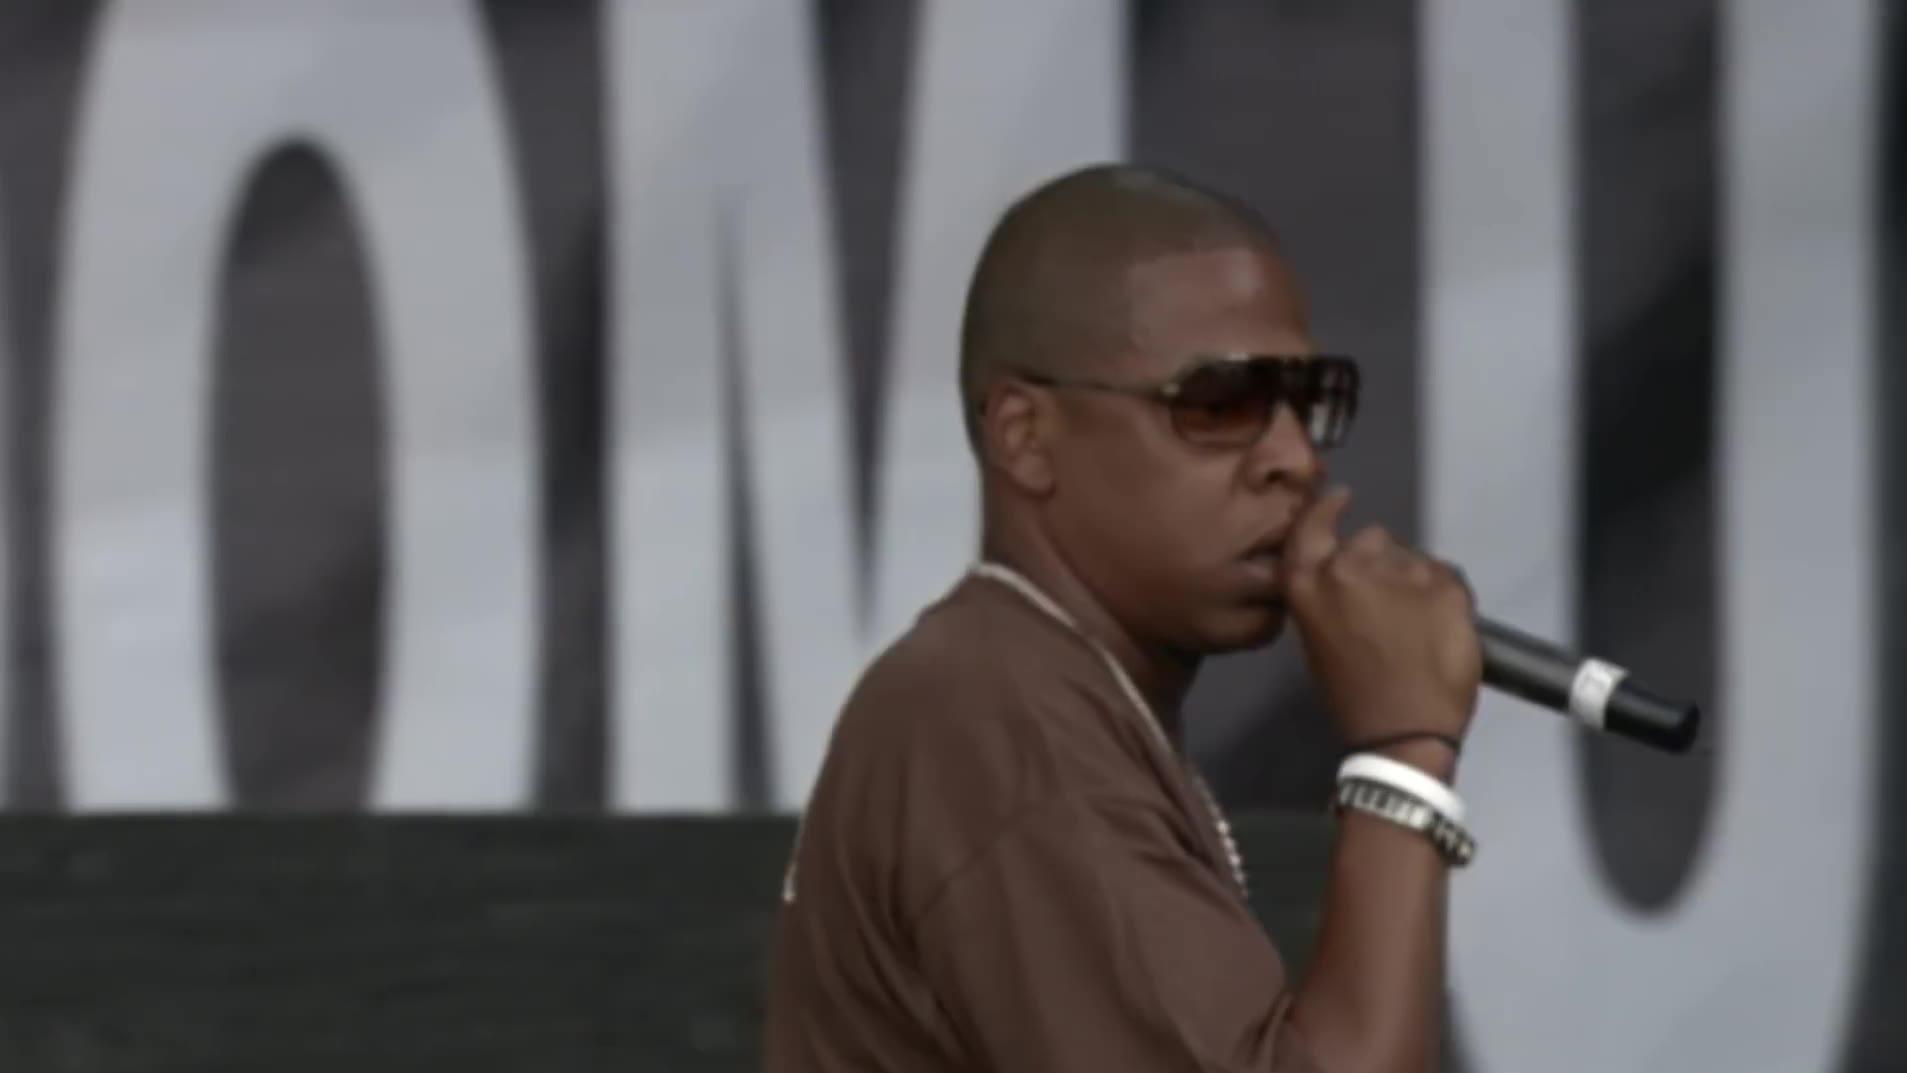 林肯公园 : Jay-Z - Numb : Encore